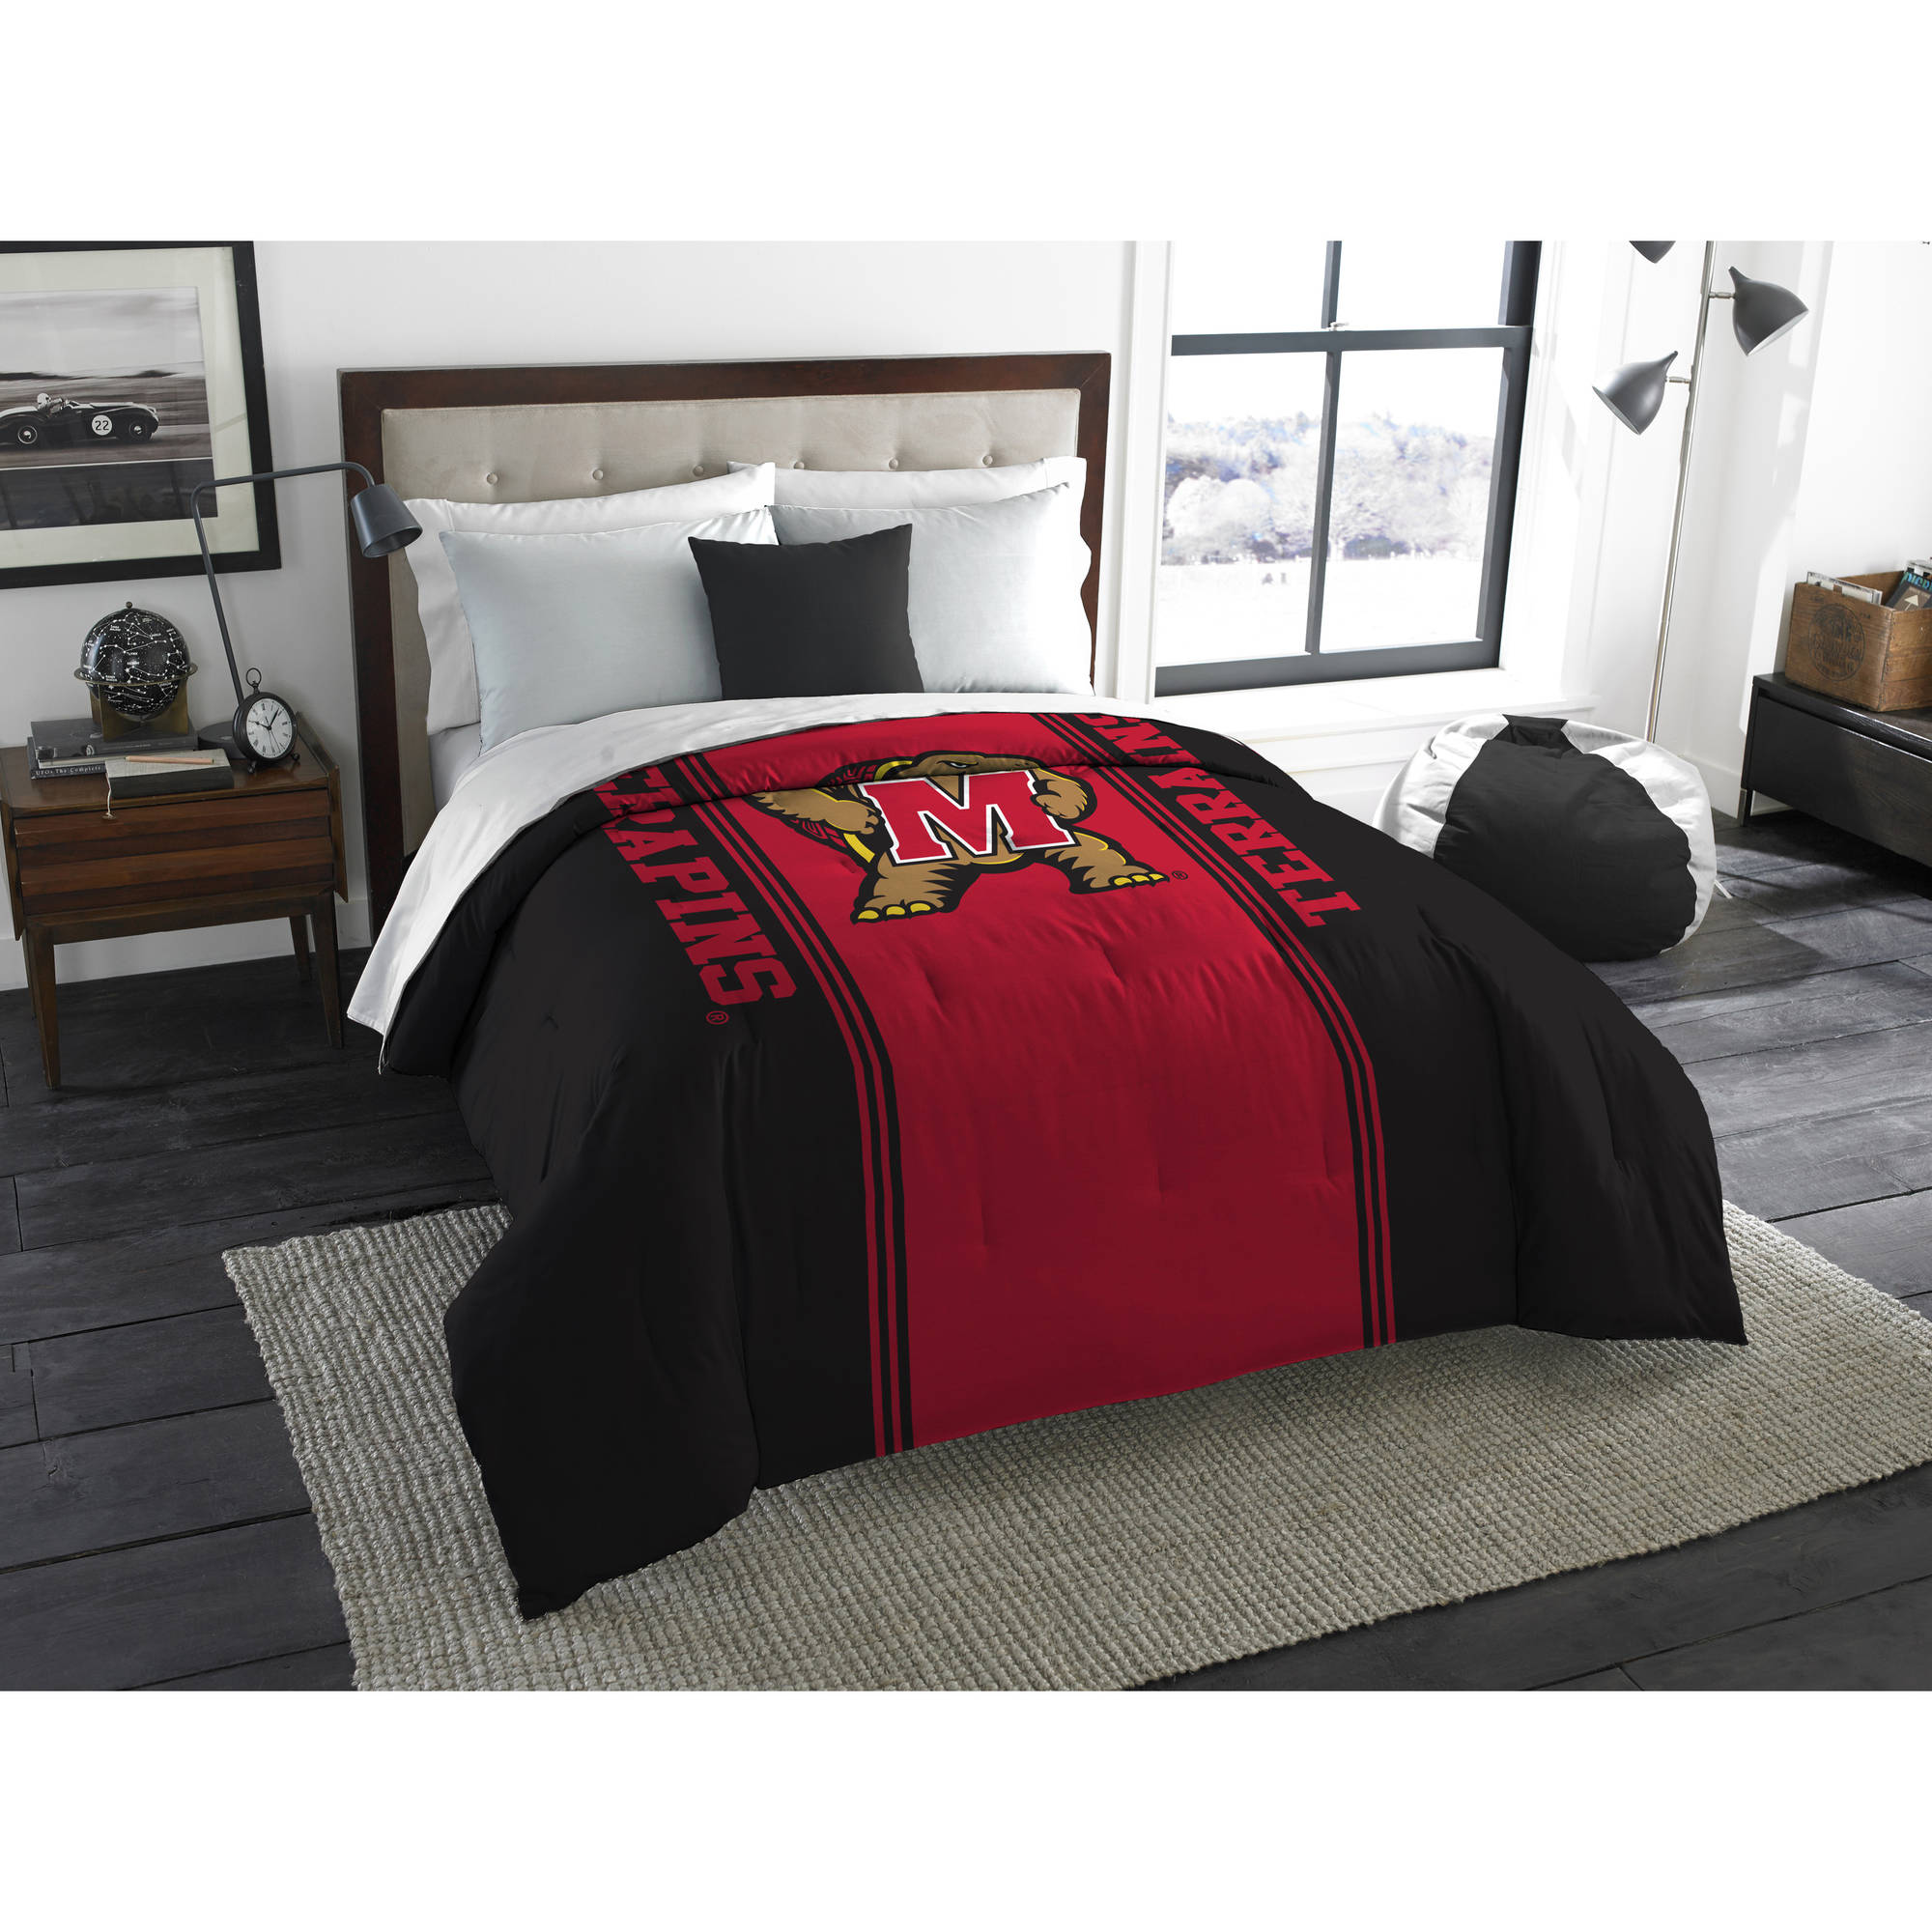 "NCAA Maryland Terrapins ""Mascot"" Twin/Full Bedding Comforter"